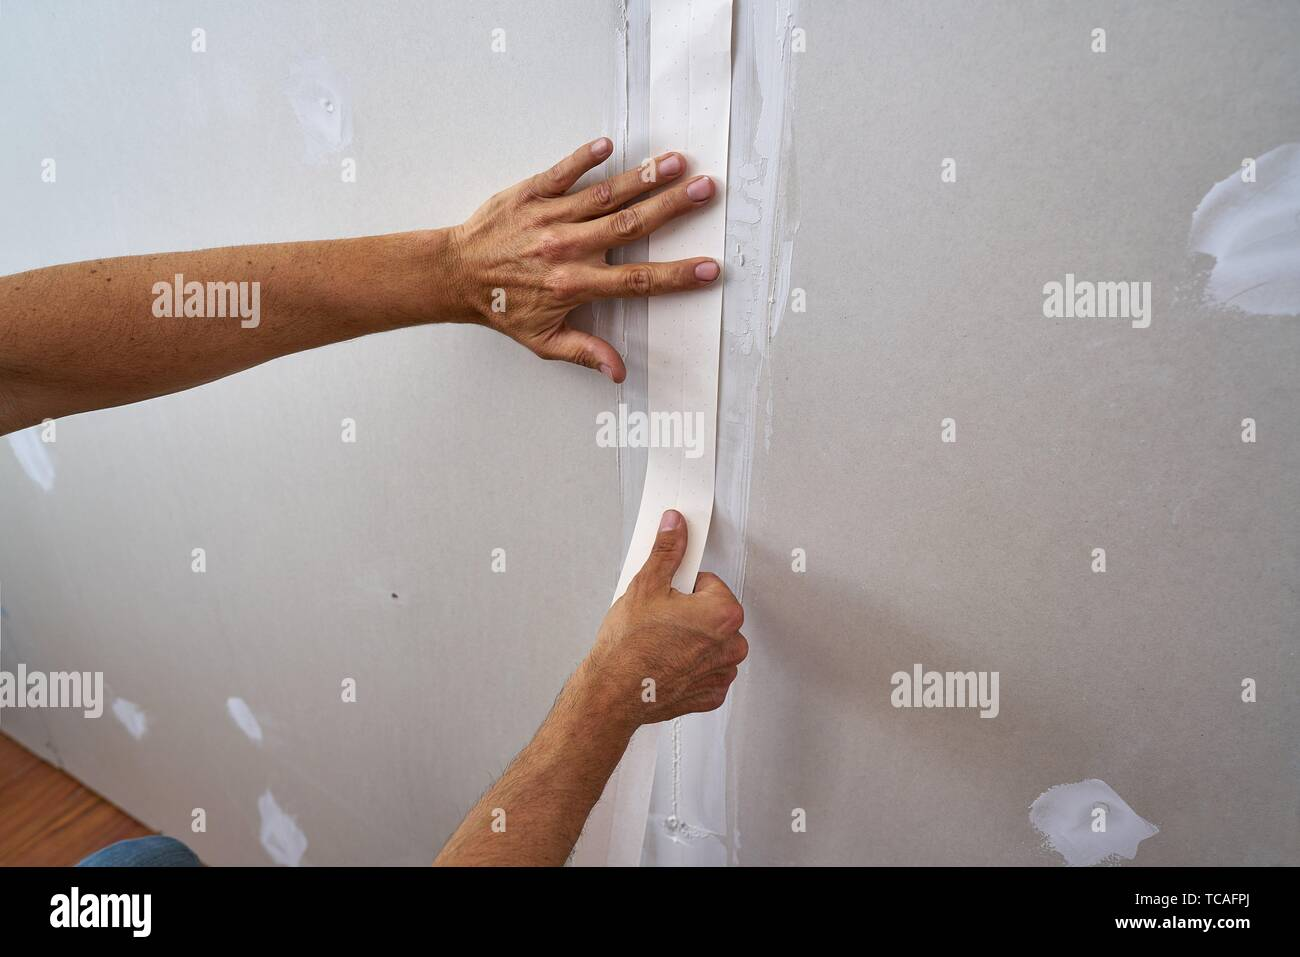 Bekannt Gipsplatten Stockfotos & Gipsplatten Bilder - Alamy TP75